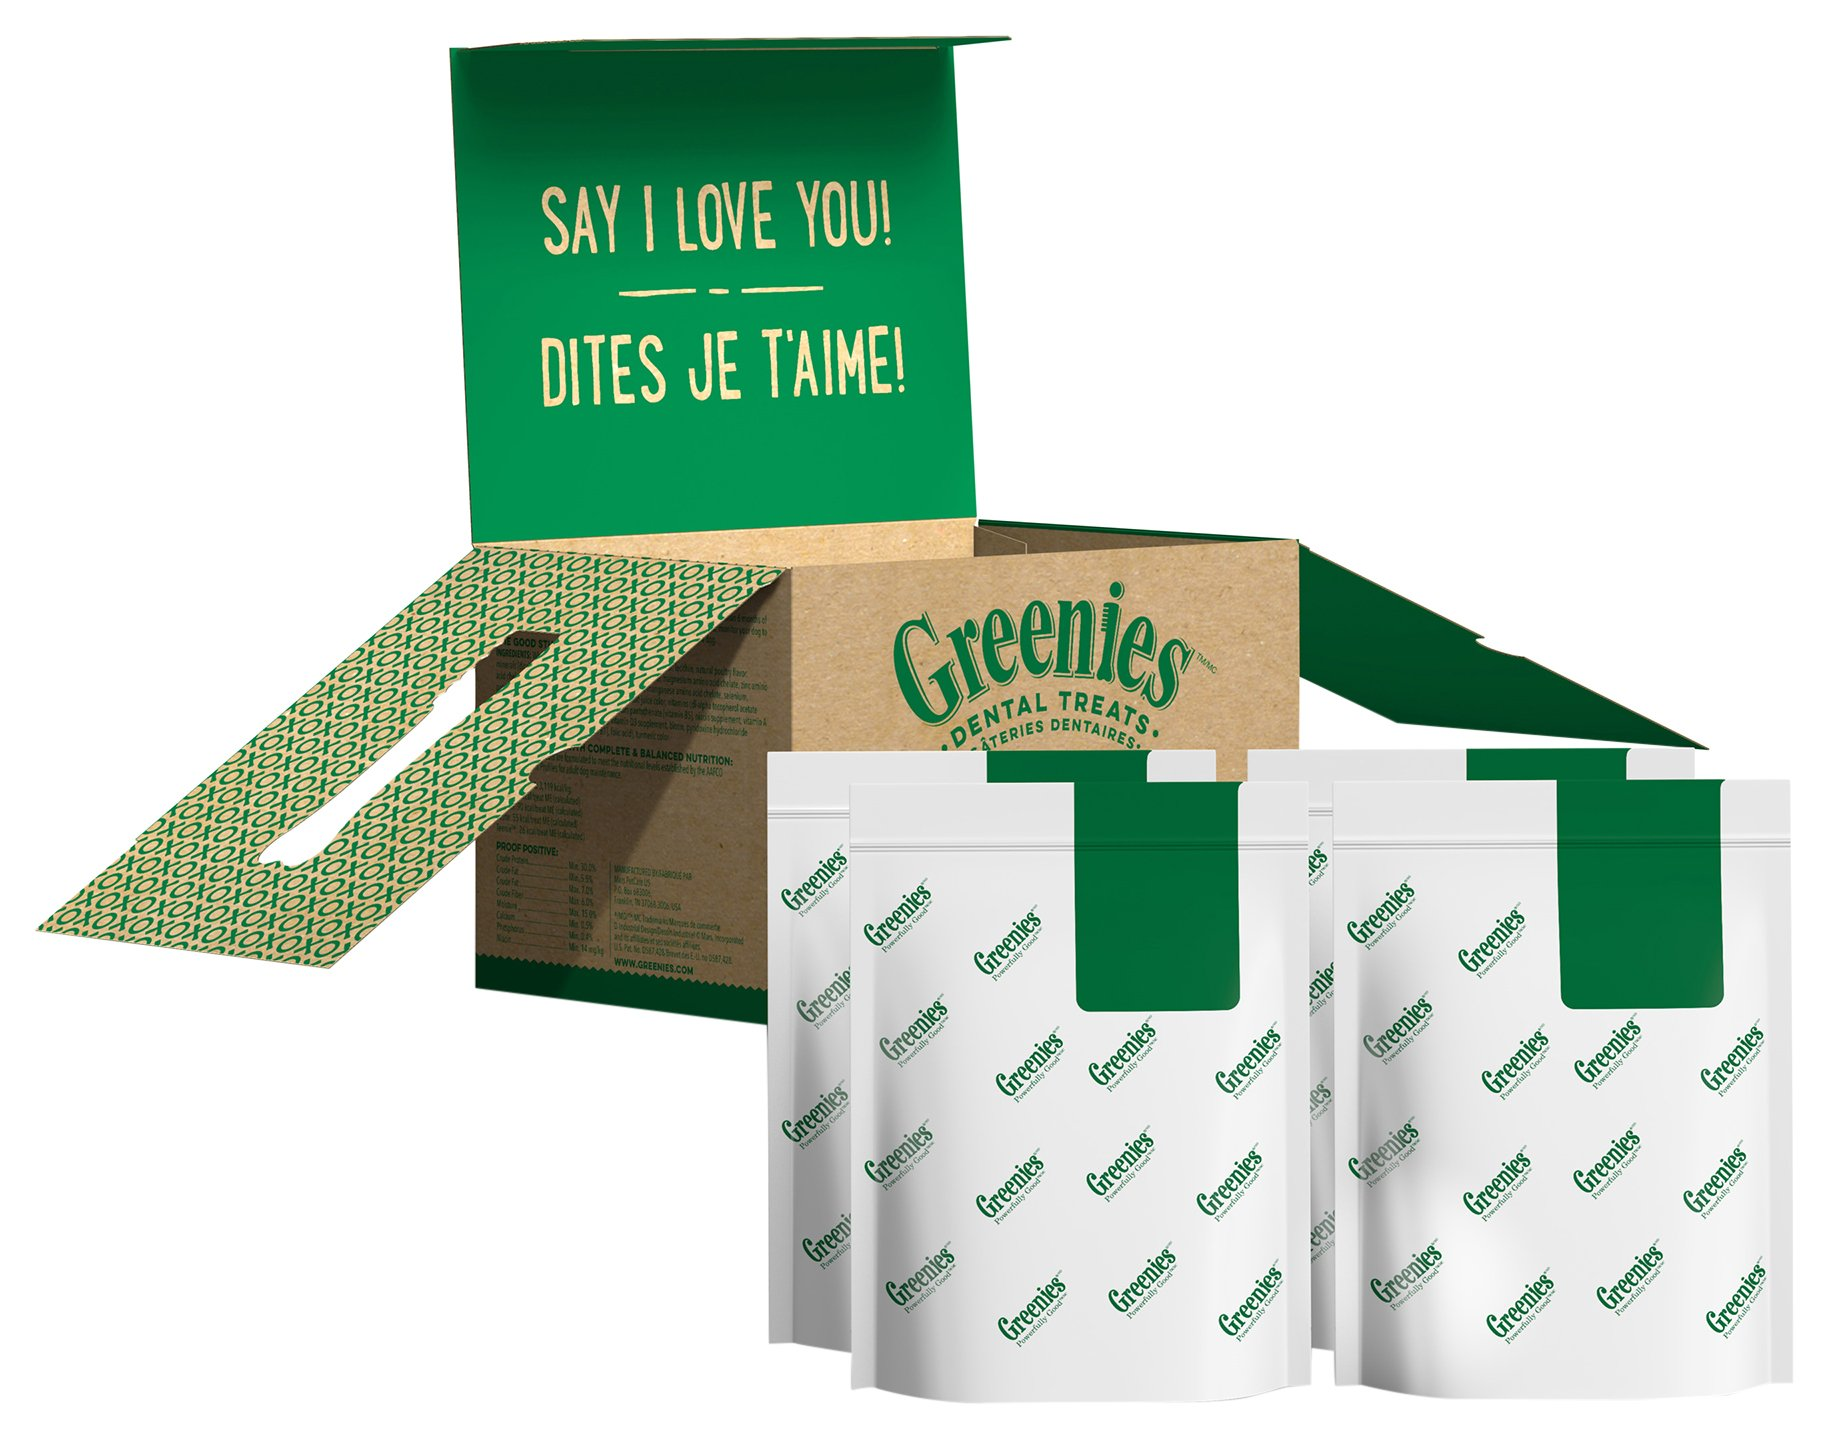 GREENIES Original Petite Dog Dental Chews - 72 Ounces 120 Treats